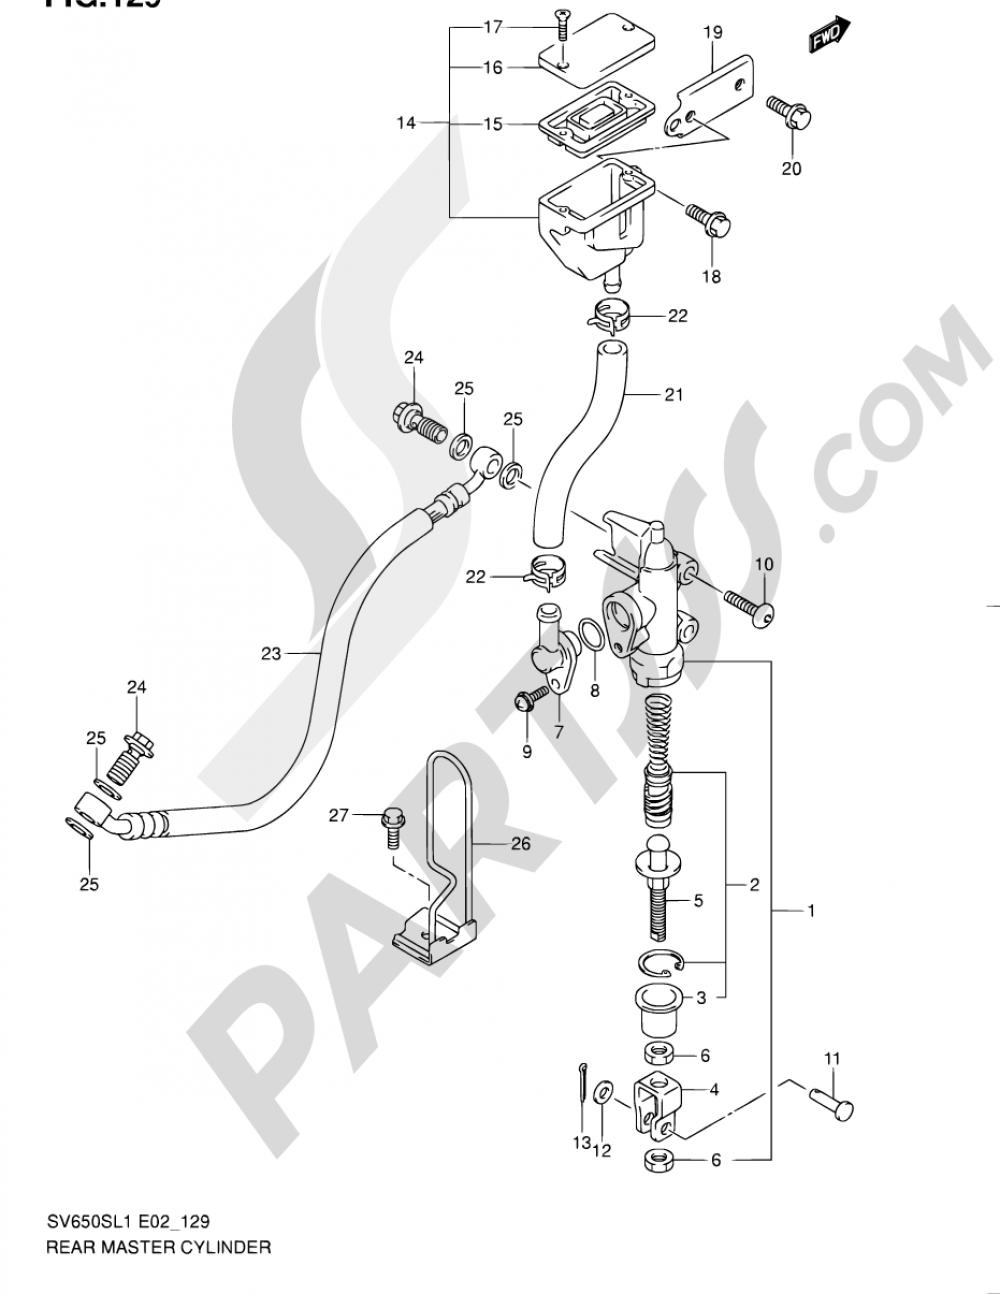 129 - REAR MASTER CYLINDER (SV650SUL1 E24) Suzuki SV650S 2011